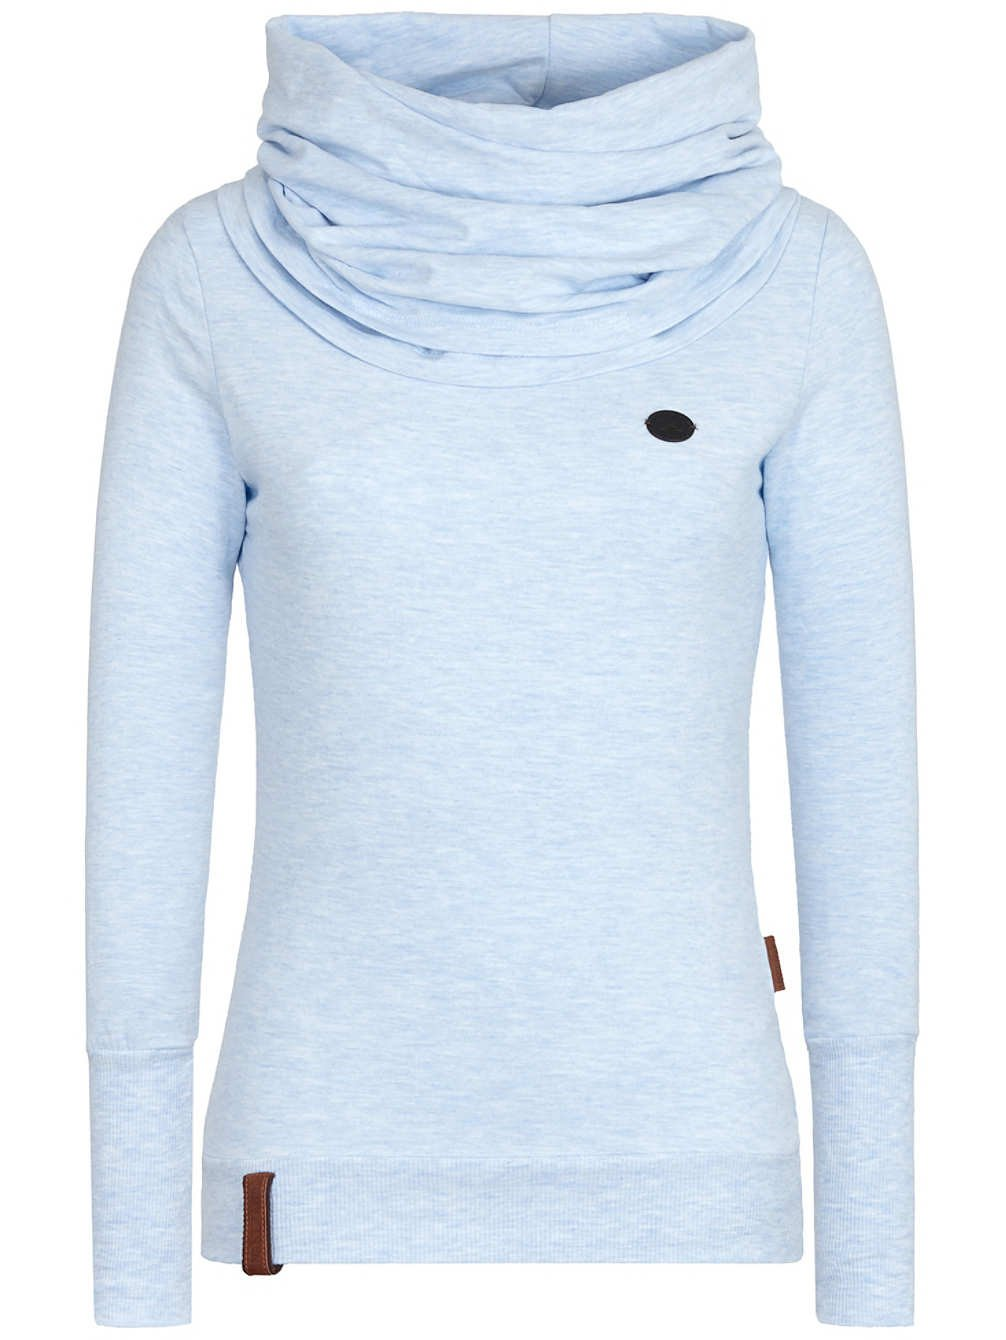 Sweater Women Naketano Kurzer Schniedelwutz IV Sweater: Amazon.co.uk:  Clothing